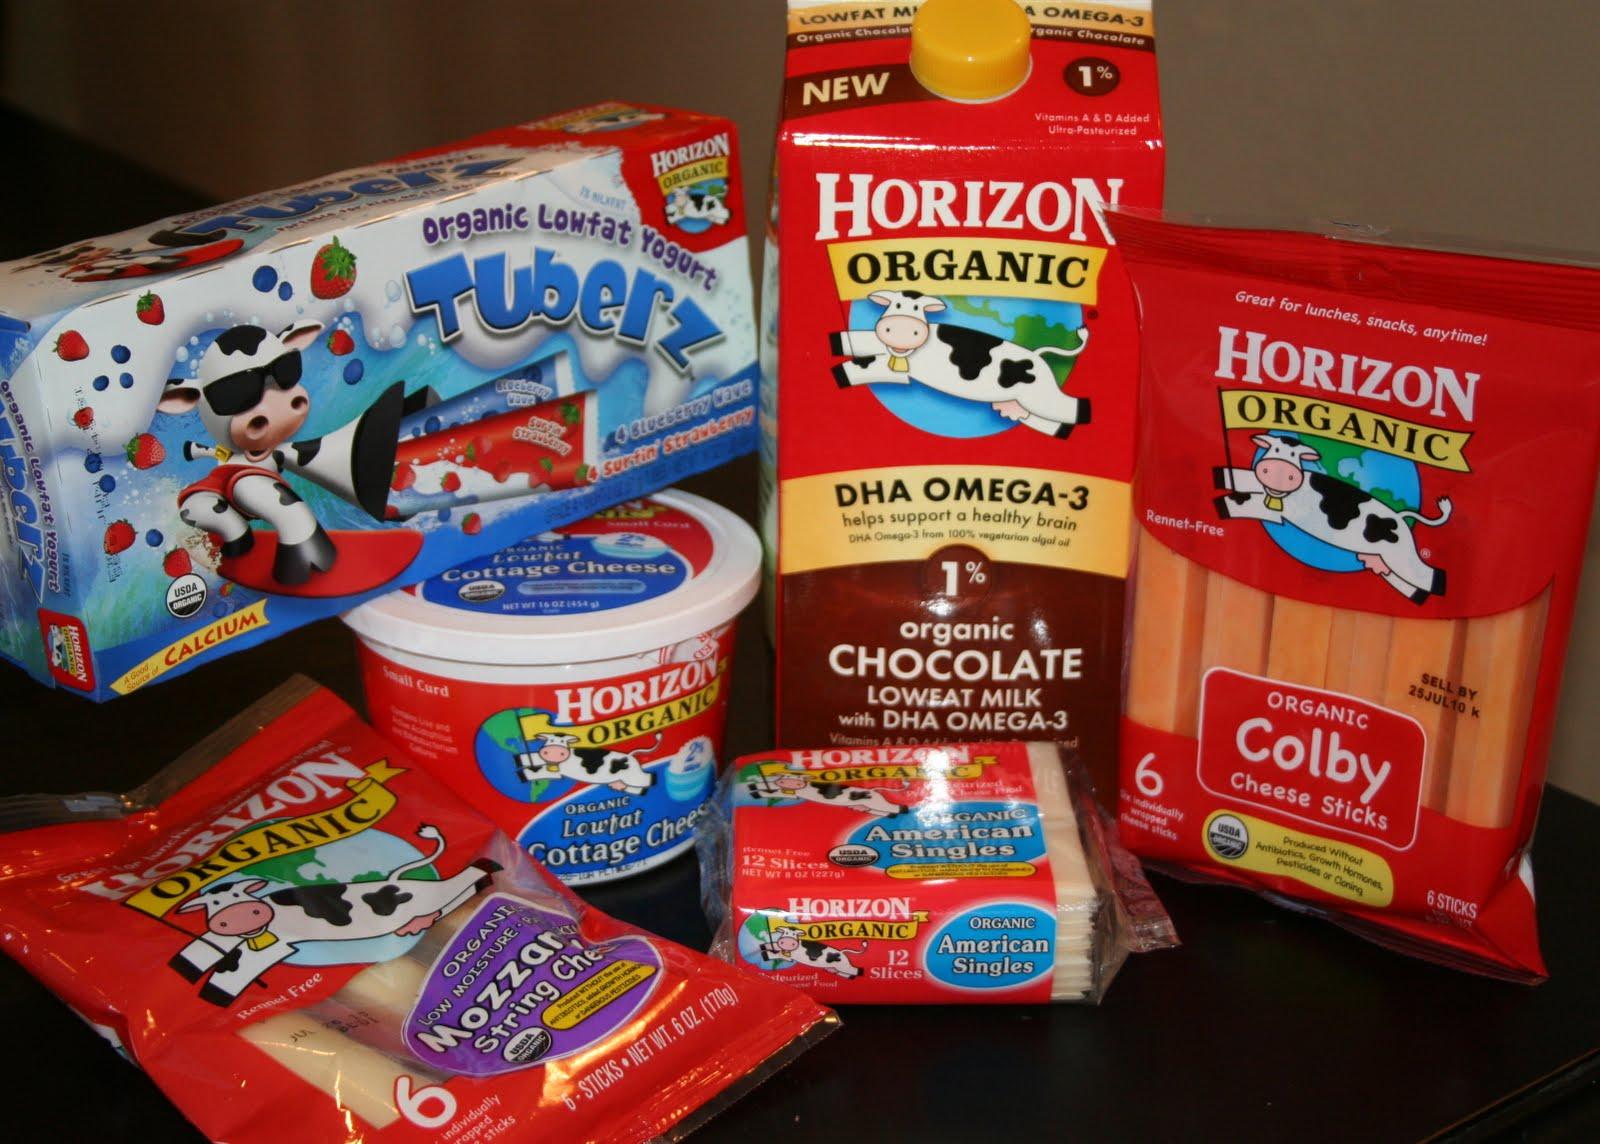 Horizon organic milk really organic